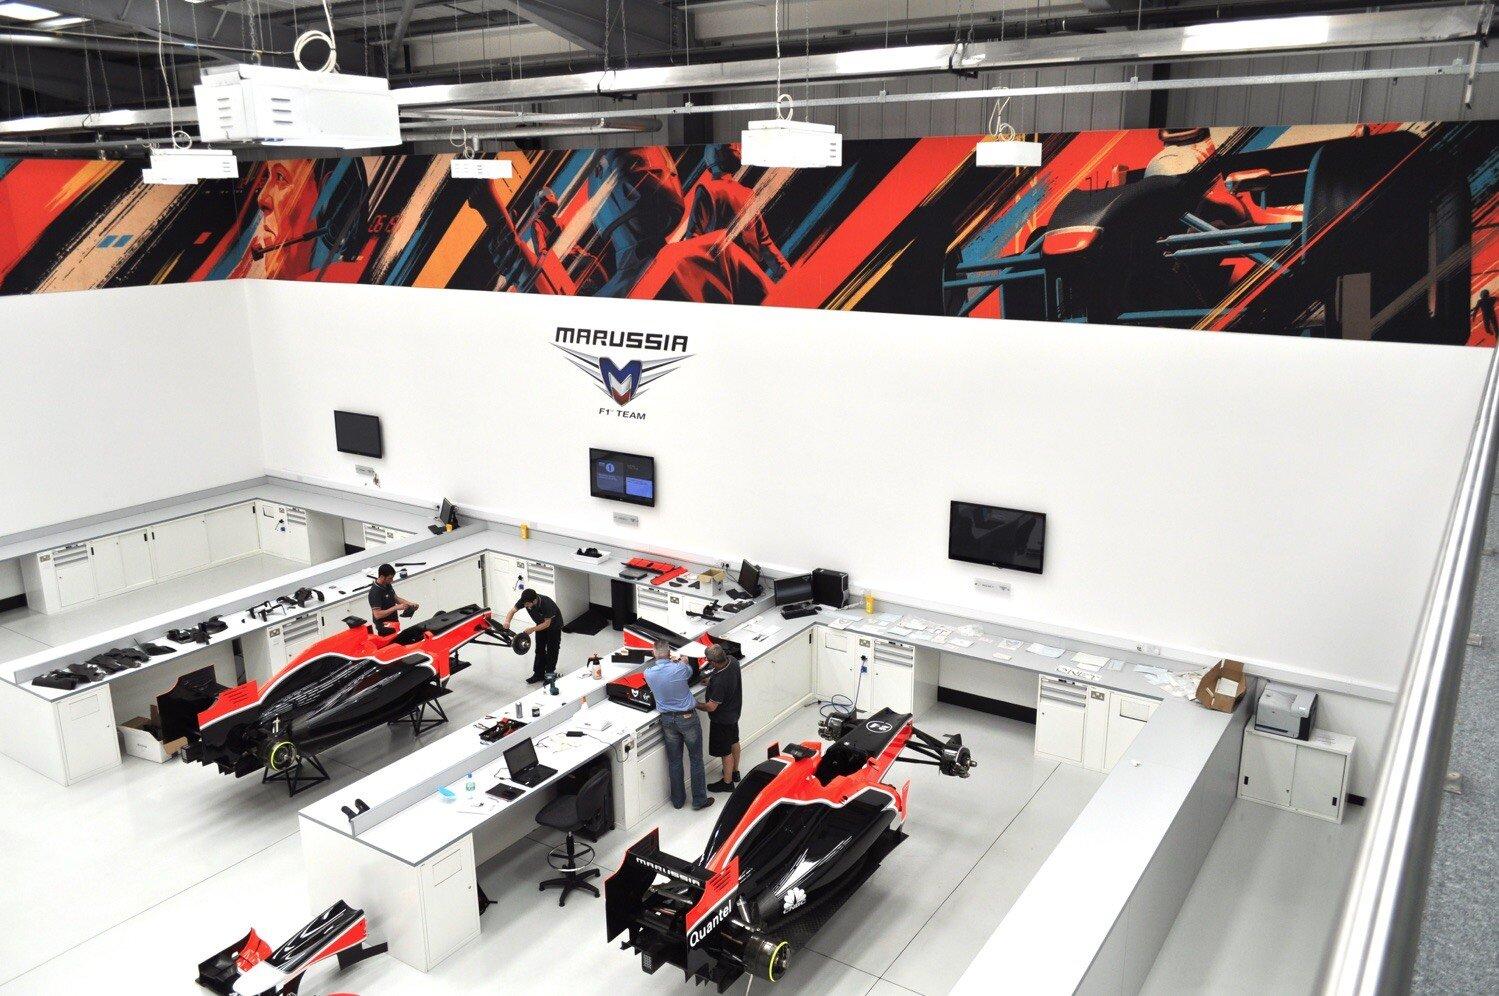 tavis-coburn-F1-team-graphic-illustration-marussia-24.jpg